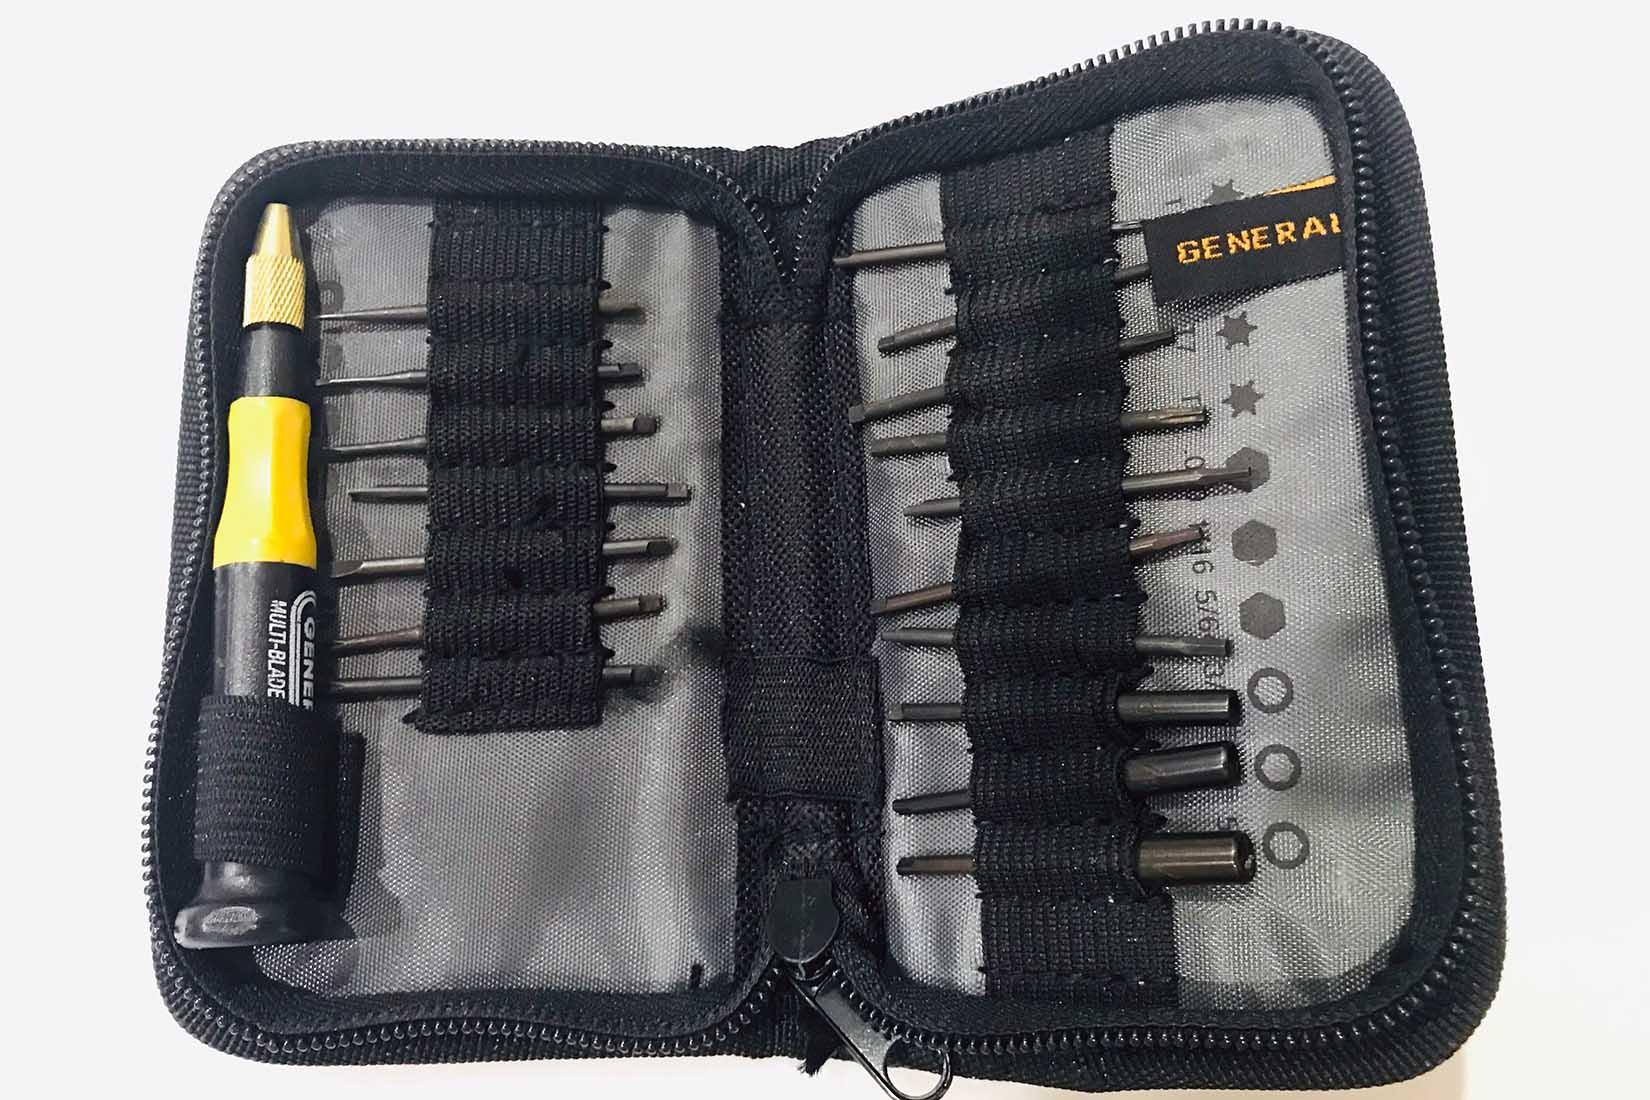 small screw driver tools